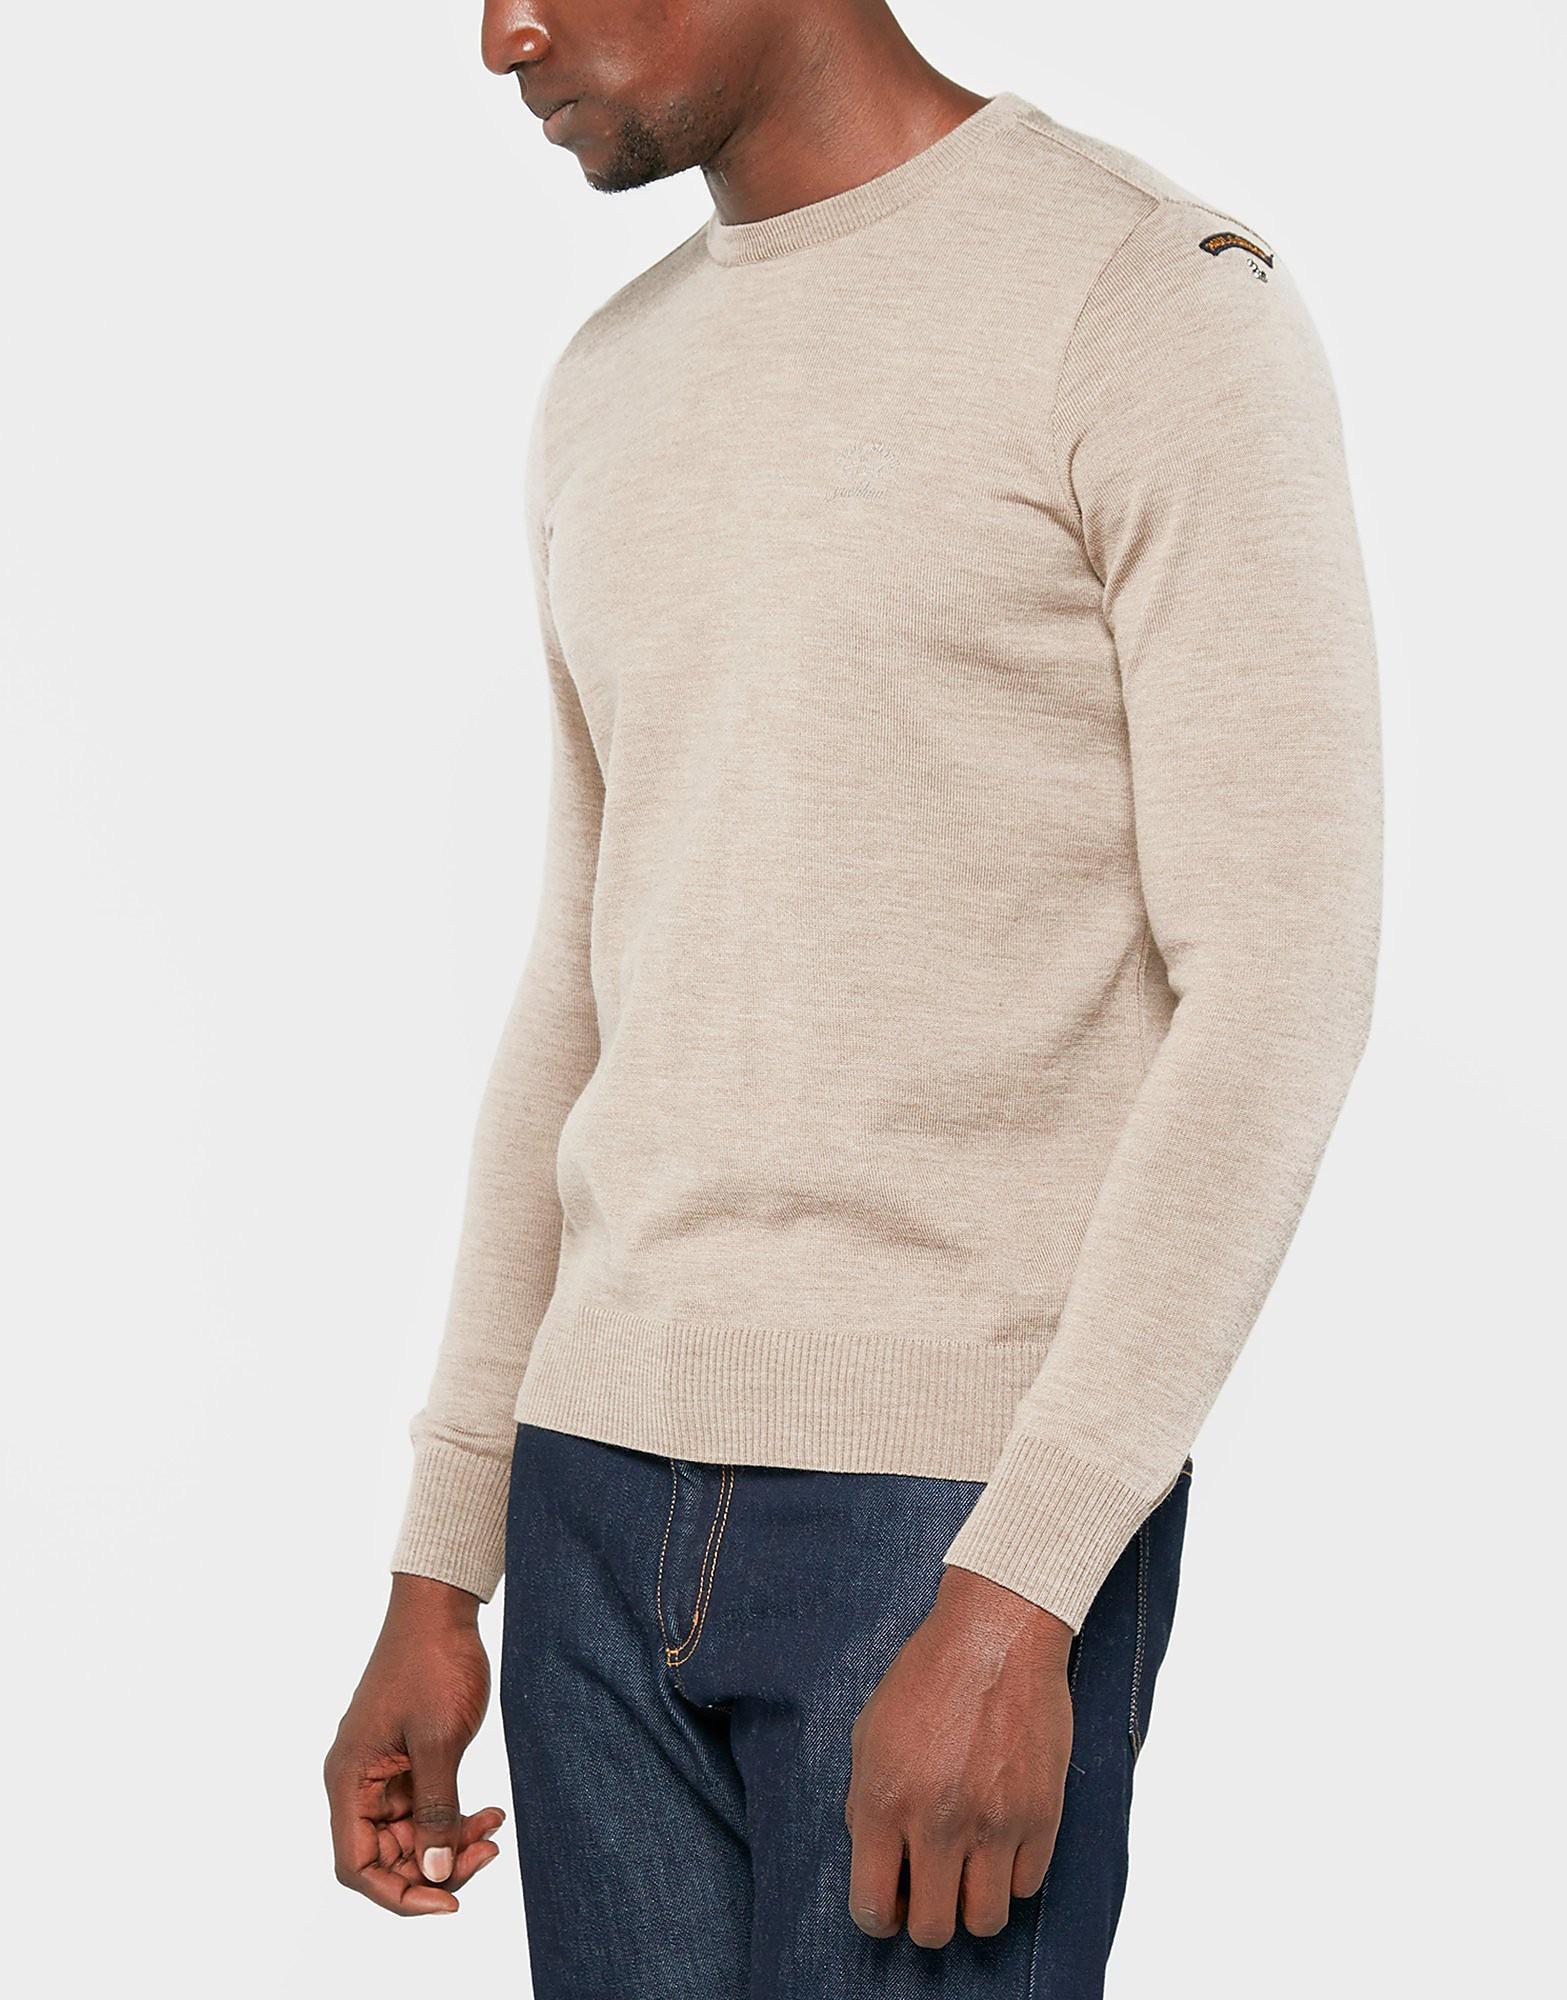 Paul and Shark Premium Knit